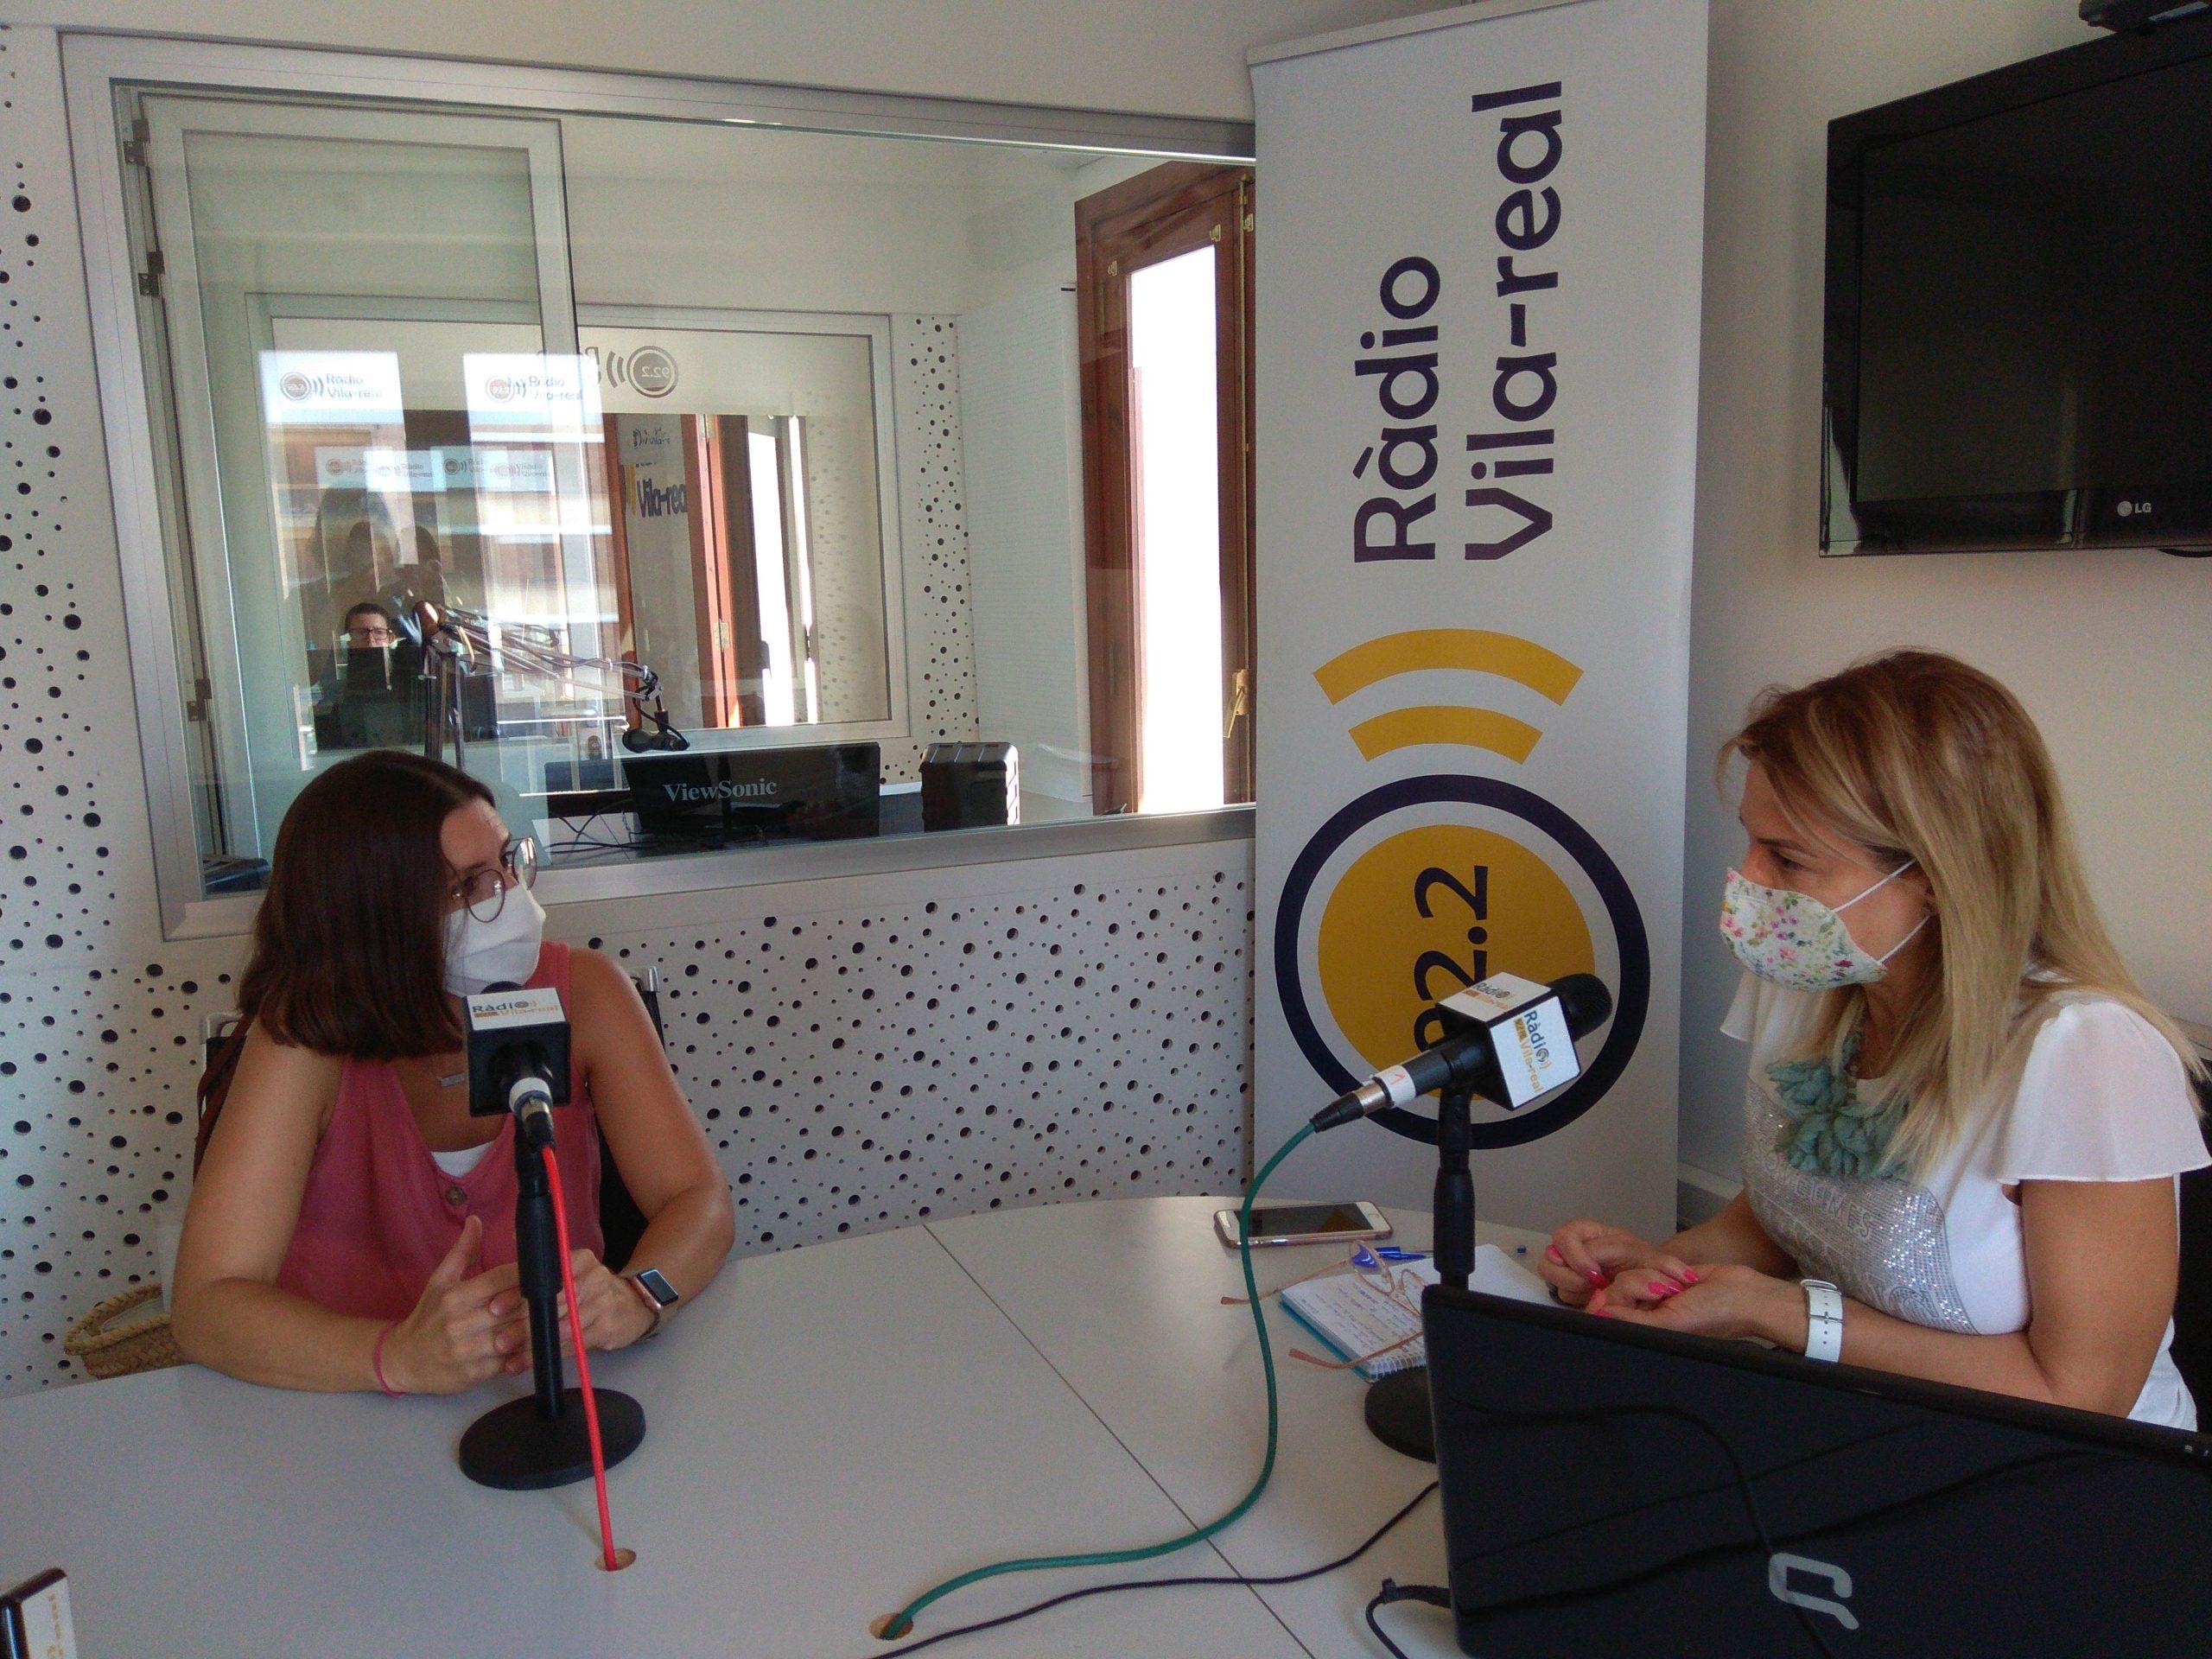 Entrevista a la concejala de Relaciones Institucionales de Vila-real, Noelia Samblás